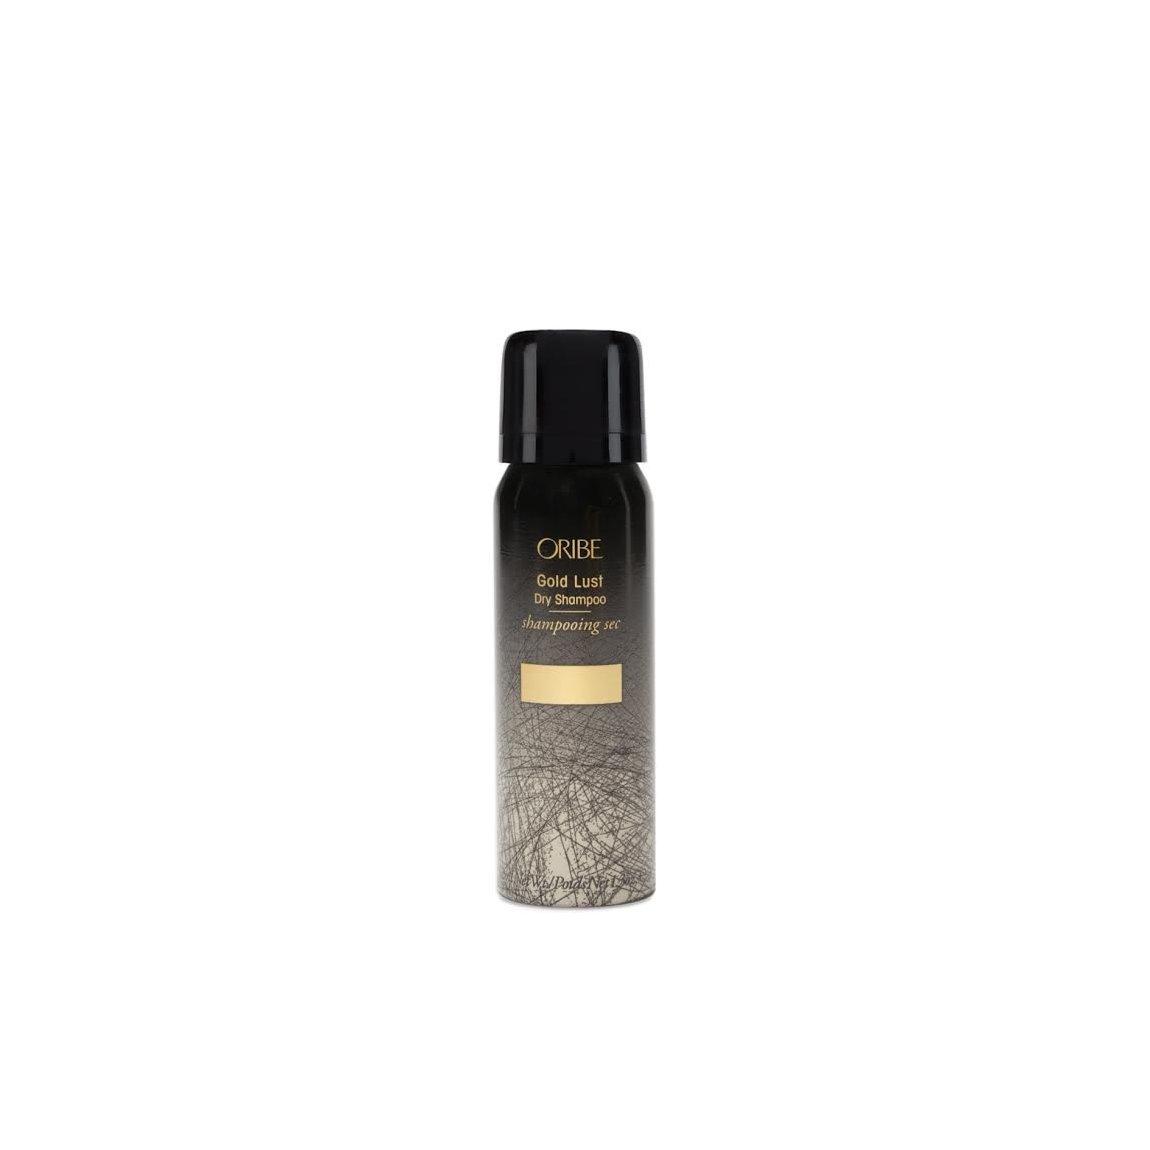 Oribe Gold Lust Dry Shampoo 1.3 oz product swatch.